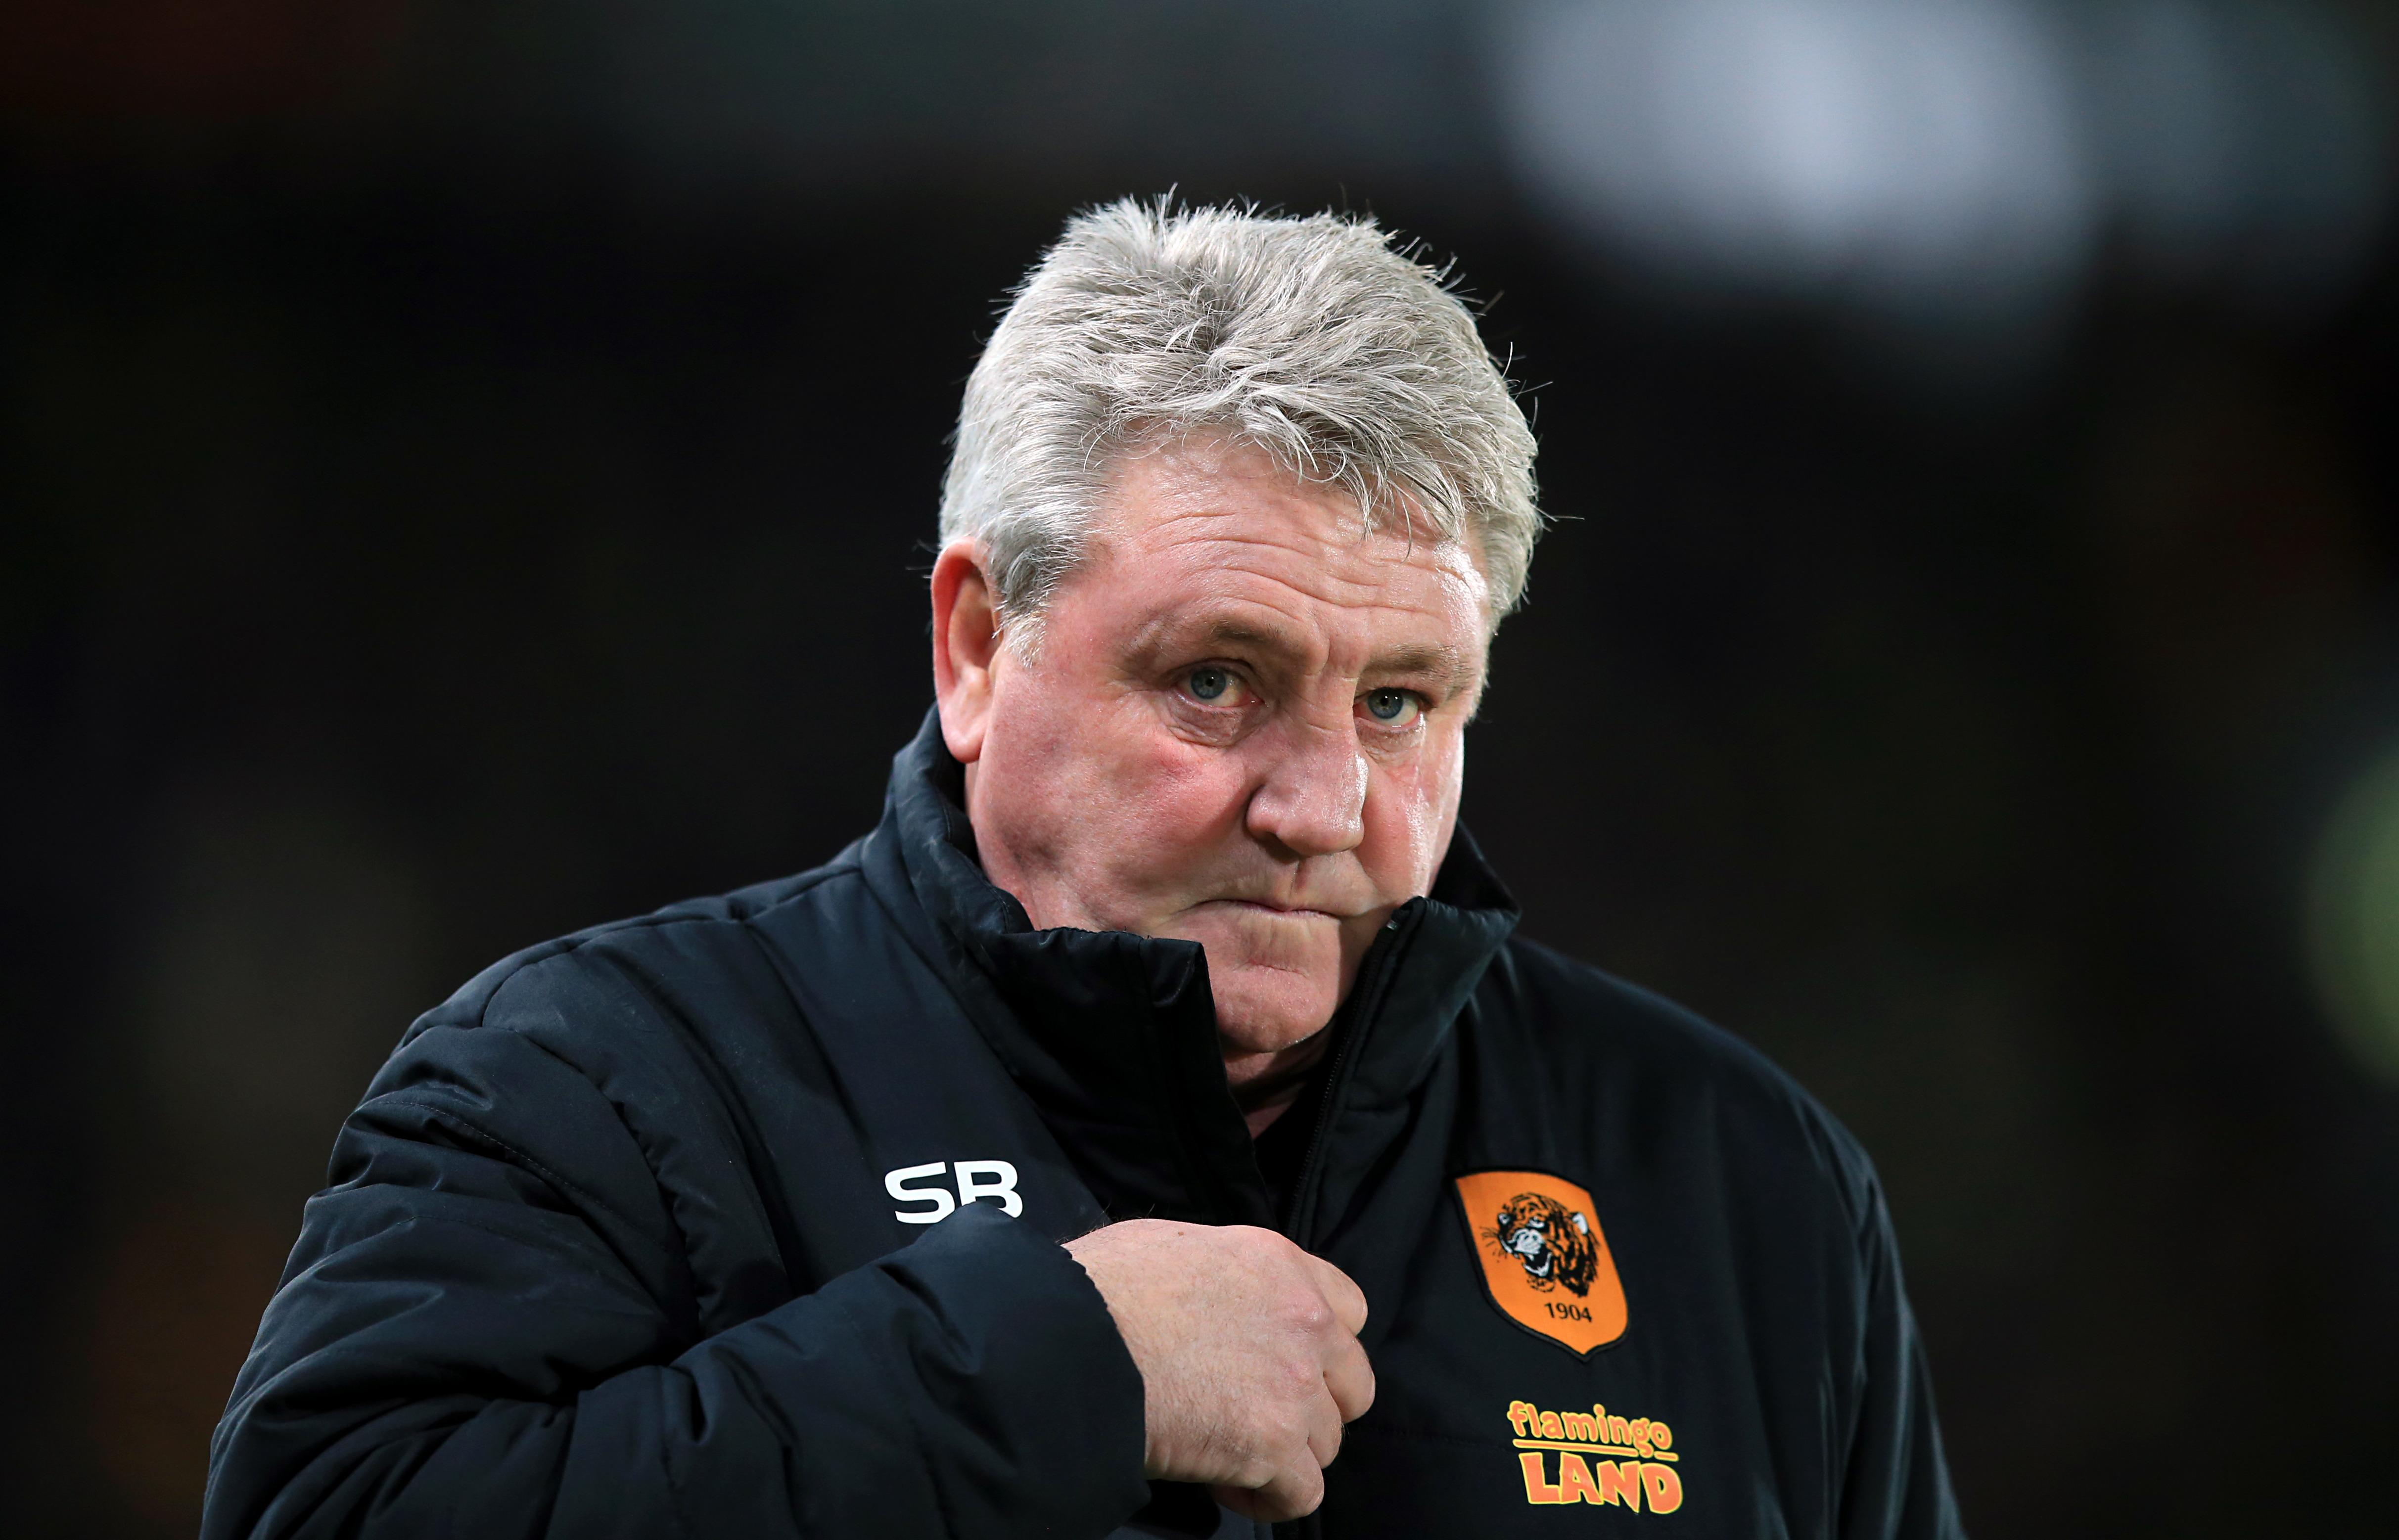 Steve Bruce was sacked just last week. Image: PA Images